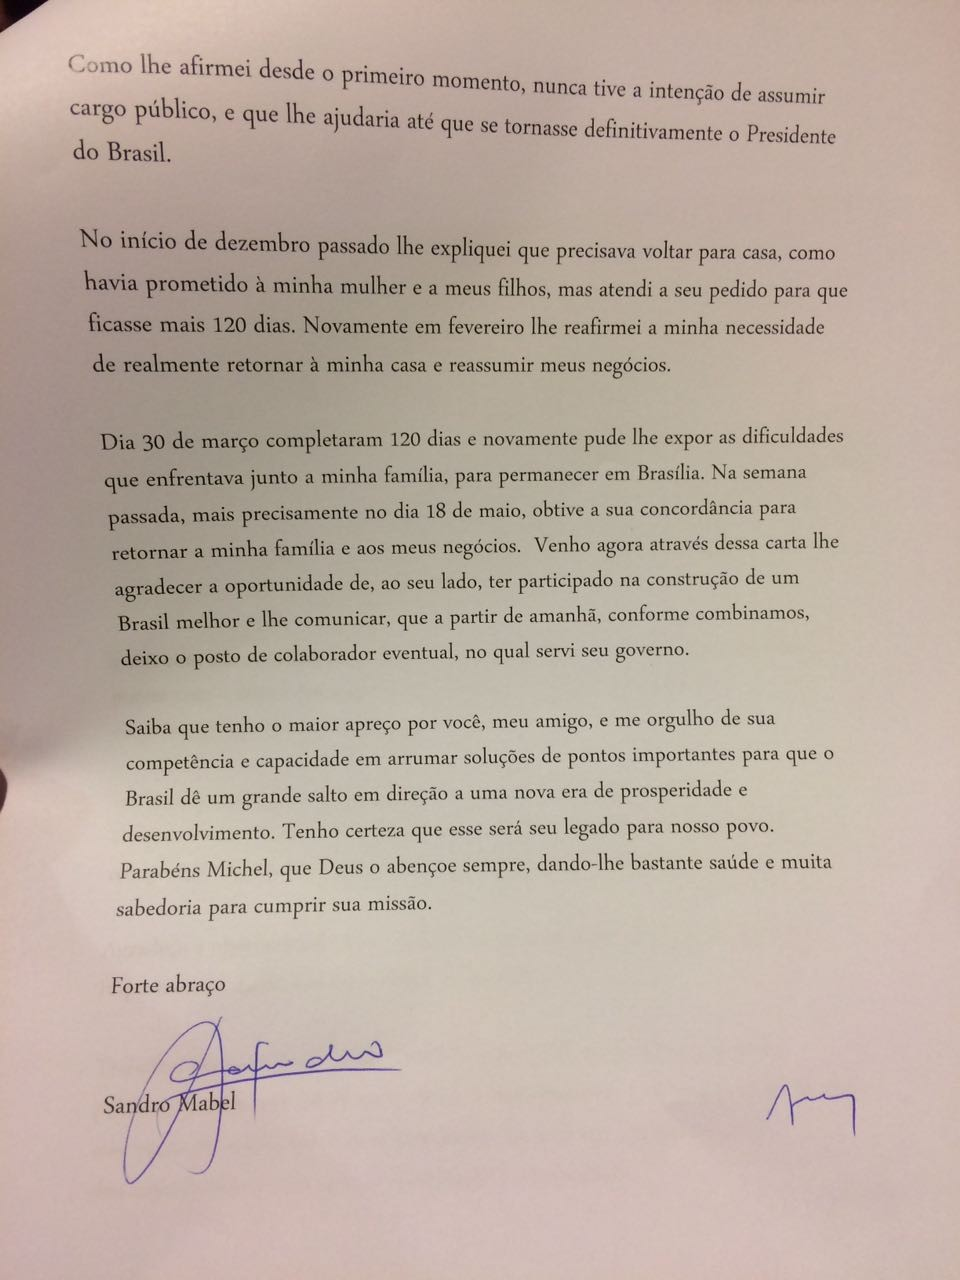 Segunda parte da carta de Sandro Mabel a Michel Temer